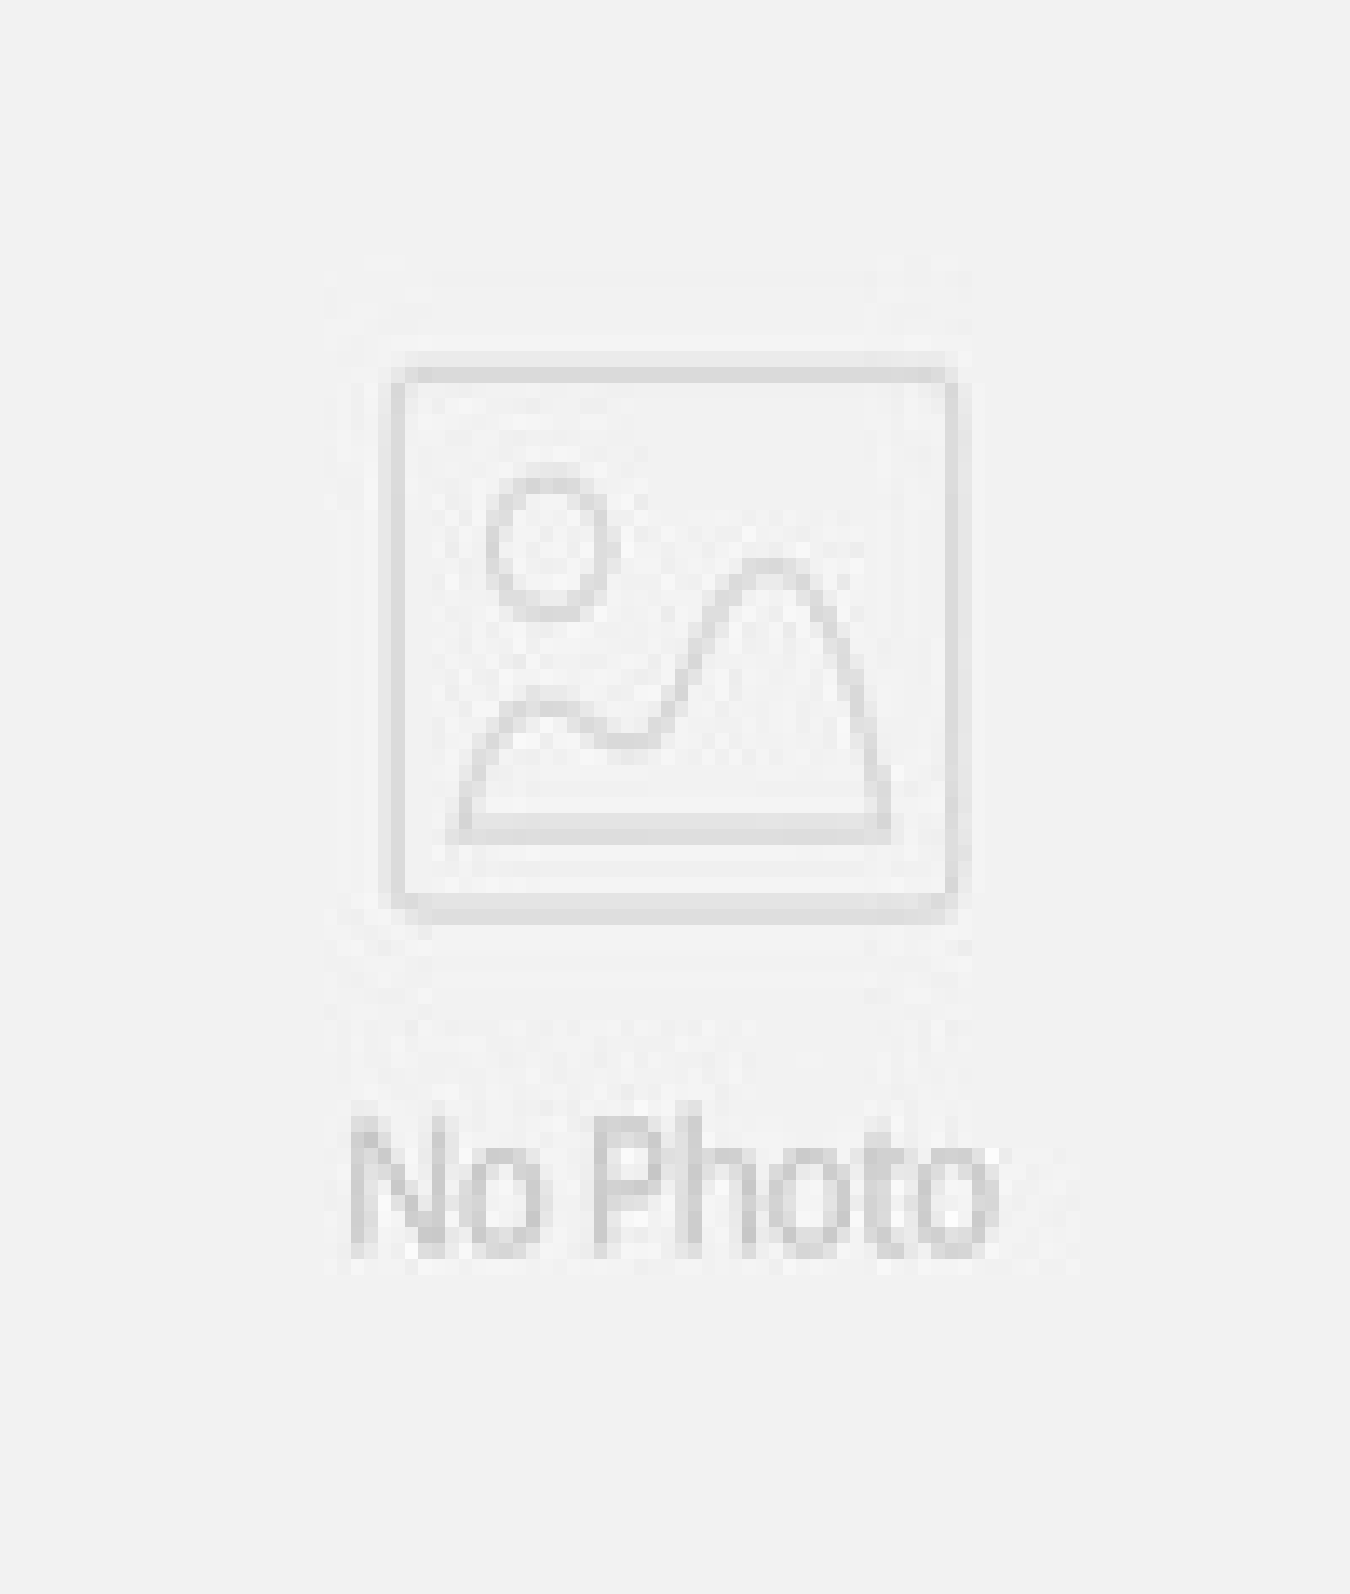 Medium oak HON 10700 Series 4 Drawer Lateral Wood File Cabinet